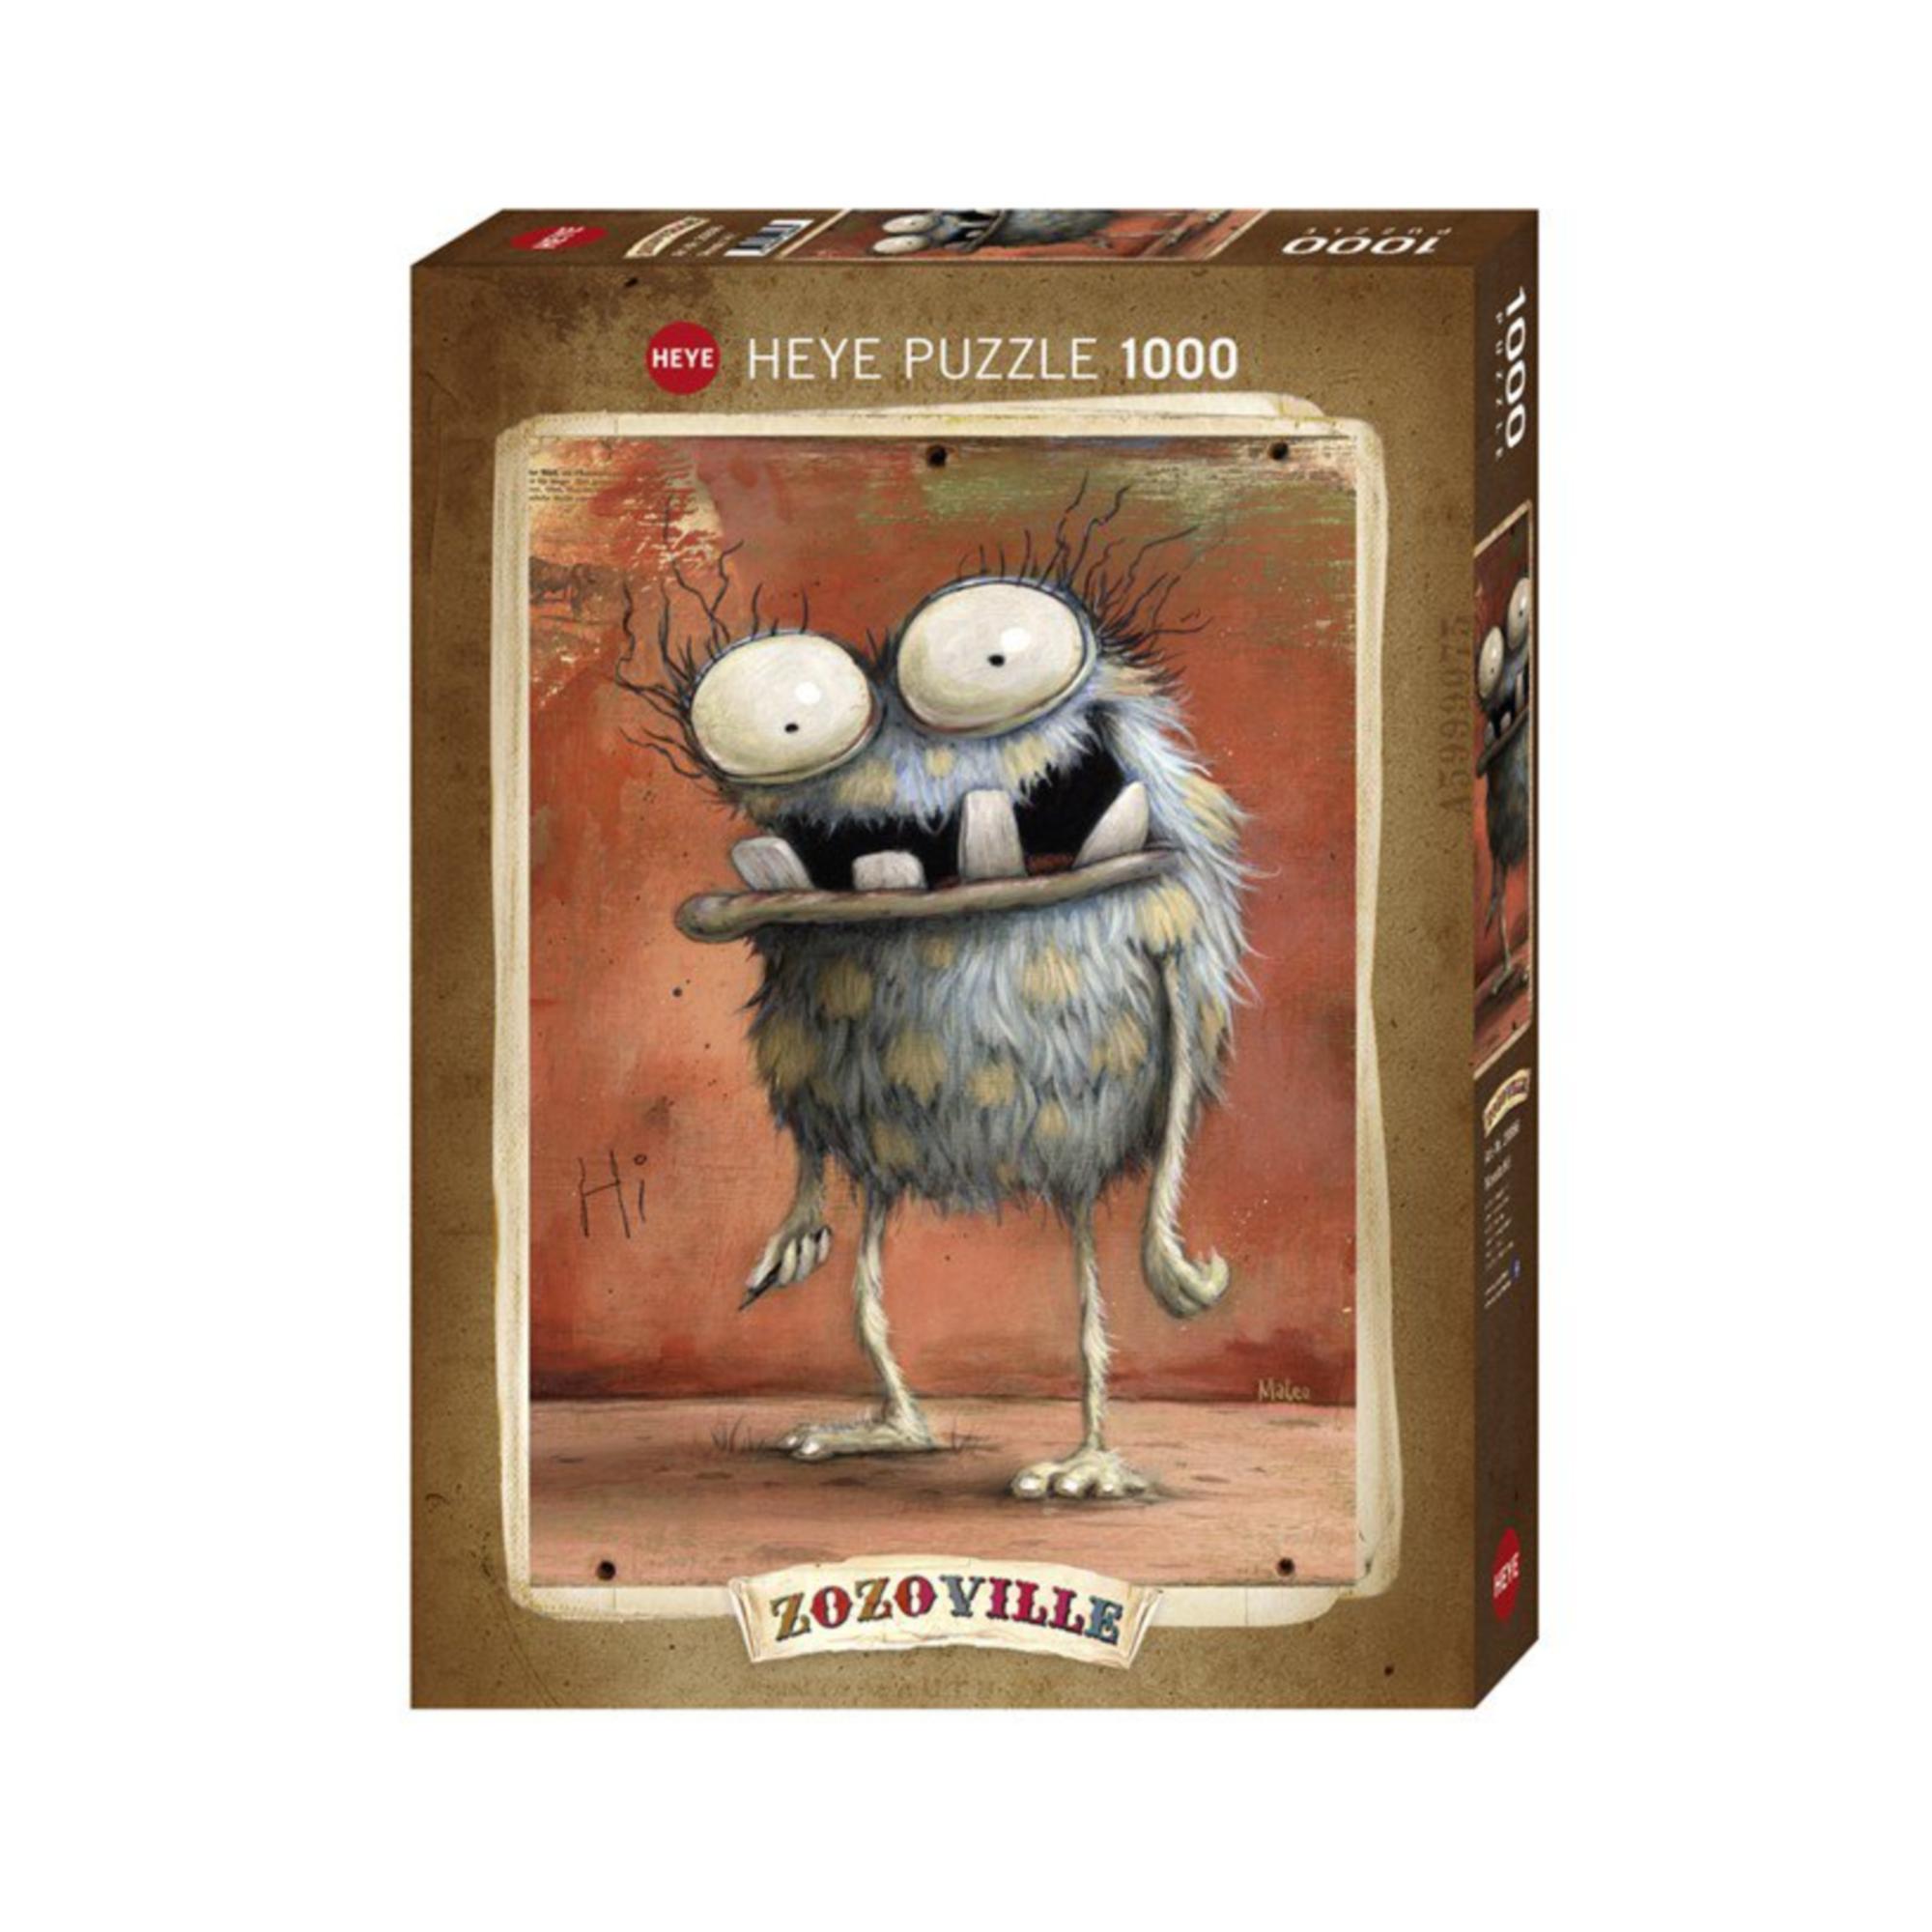 Heye Puzzle 1000: Monsta Hi, Zozoville